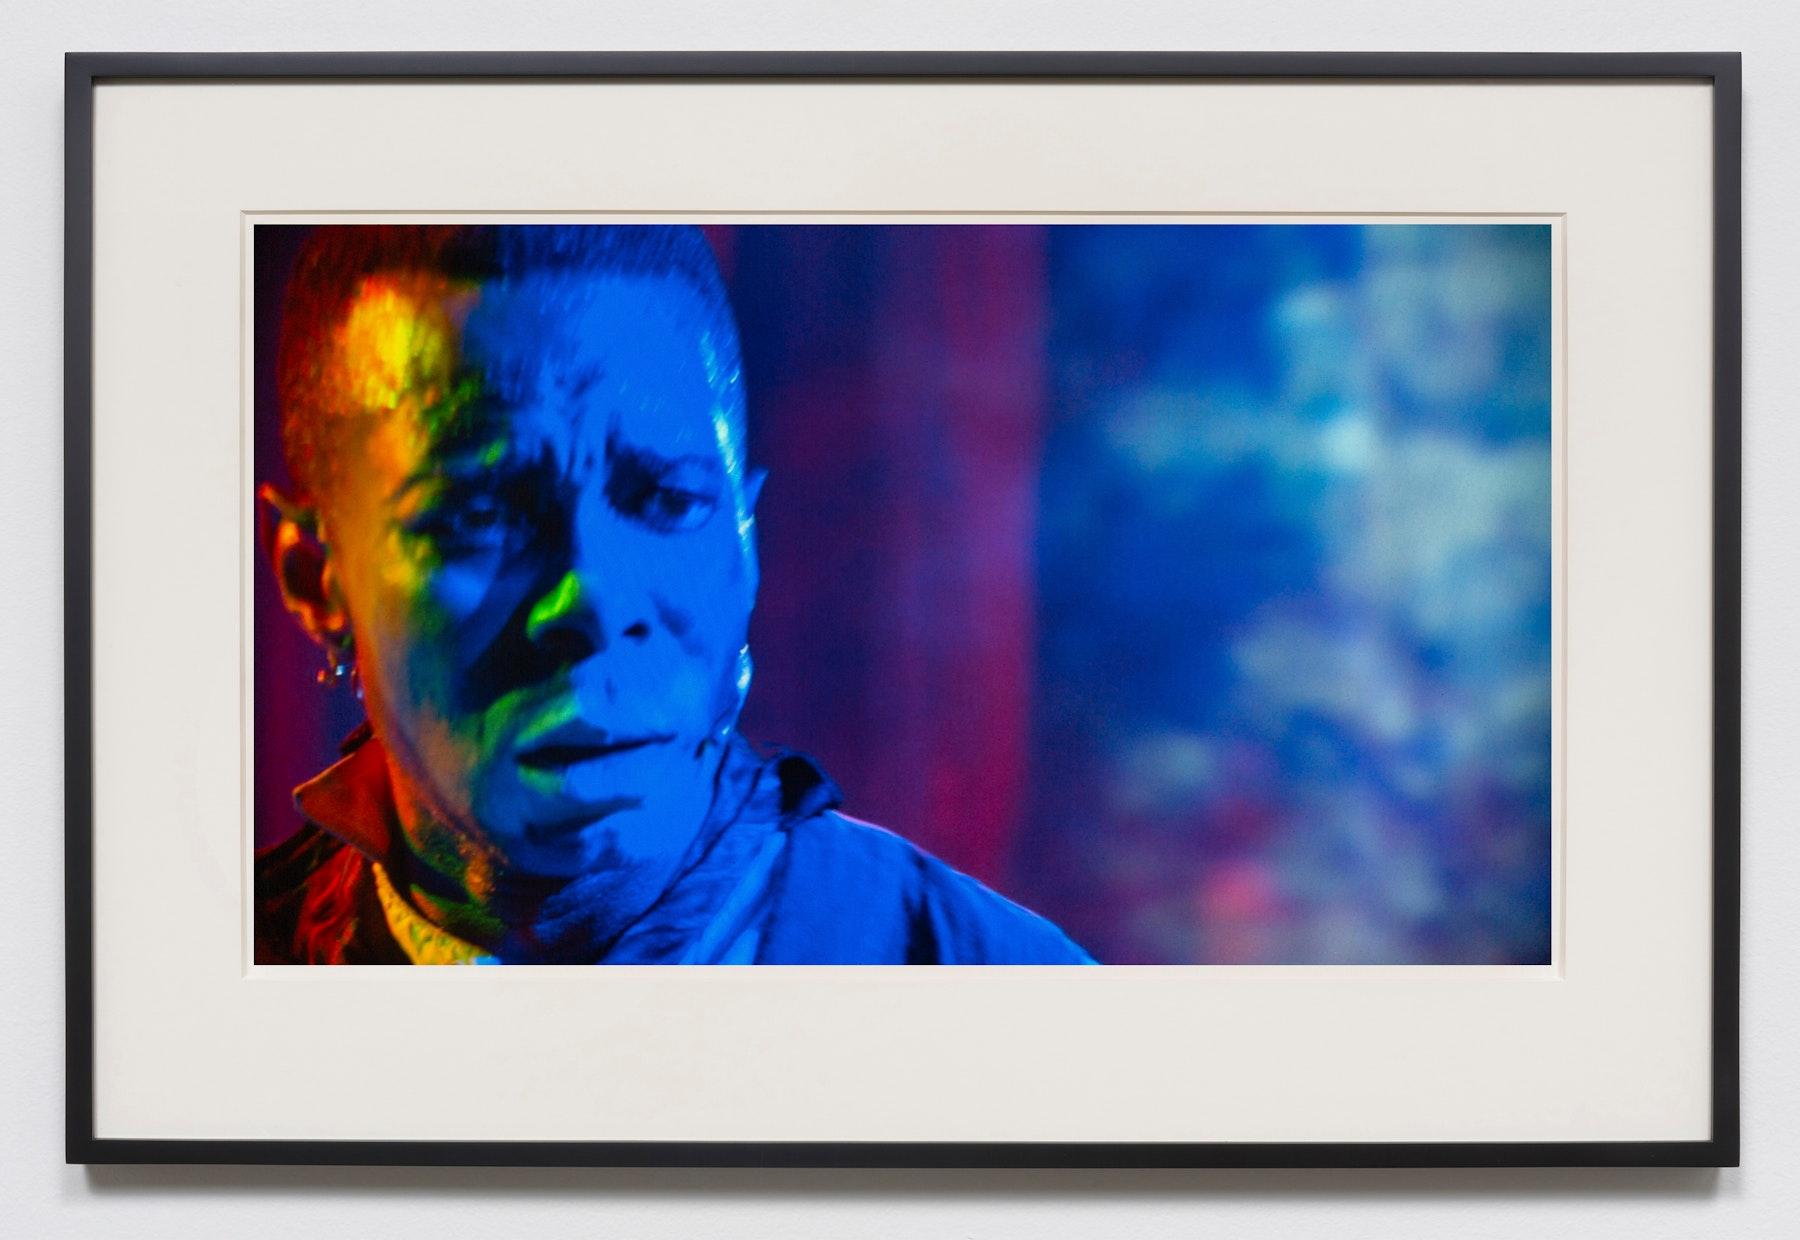 "Edgar Arceneaux ""The Natural Born Gambler,"" 2015-2020 Photographic print 20 x 36"" [HxW] (50.8 x 91.44 cm) unframed, 23.5 x 39.5 x 2"" [HxWxD] (59.69 x 100.33 x 5.08 cm) framed Edition 1 of 5, 2 AP Inventory #ARC629.01 Courtesy of the artist and Vielmetter Los Angeles"